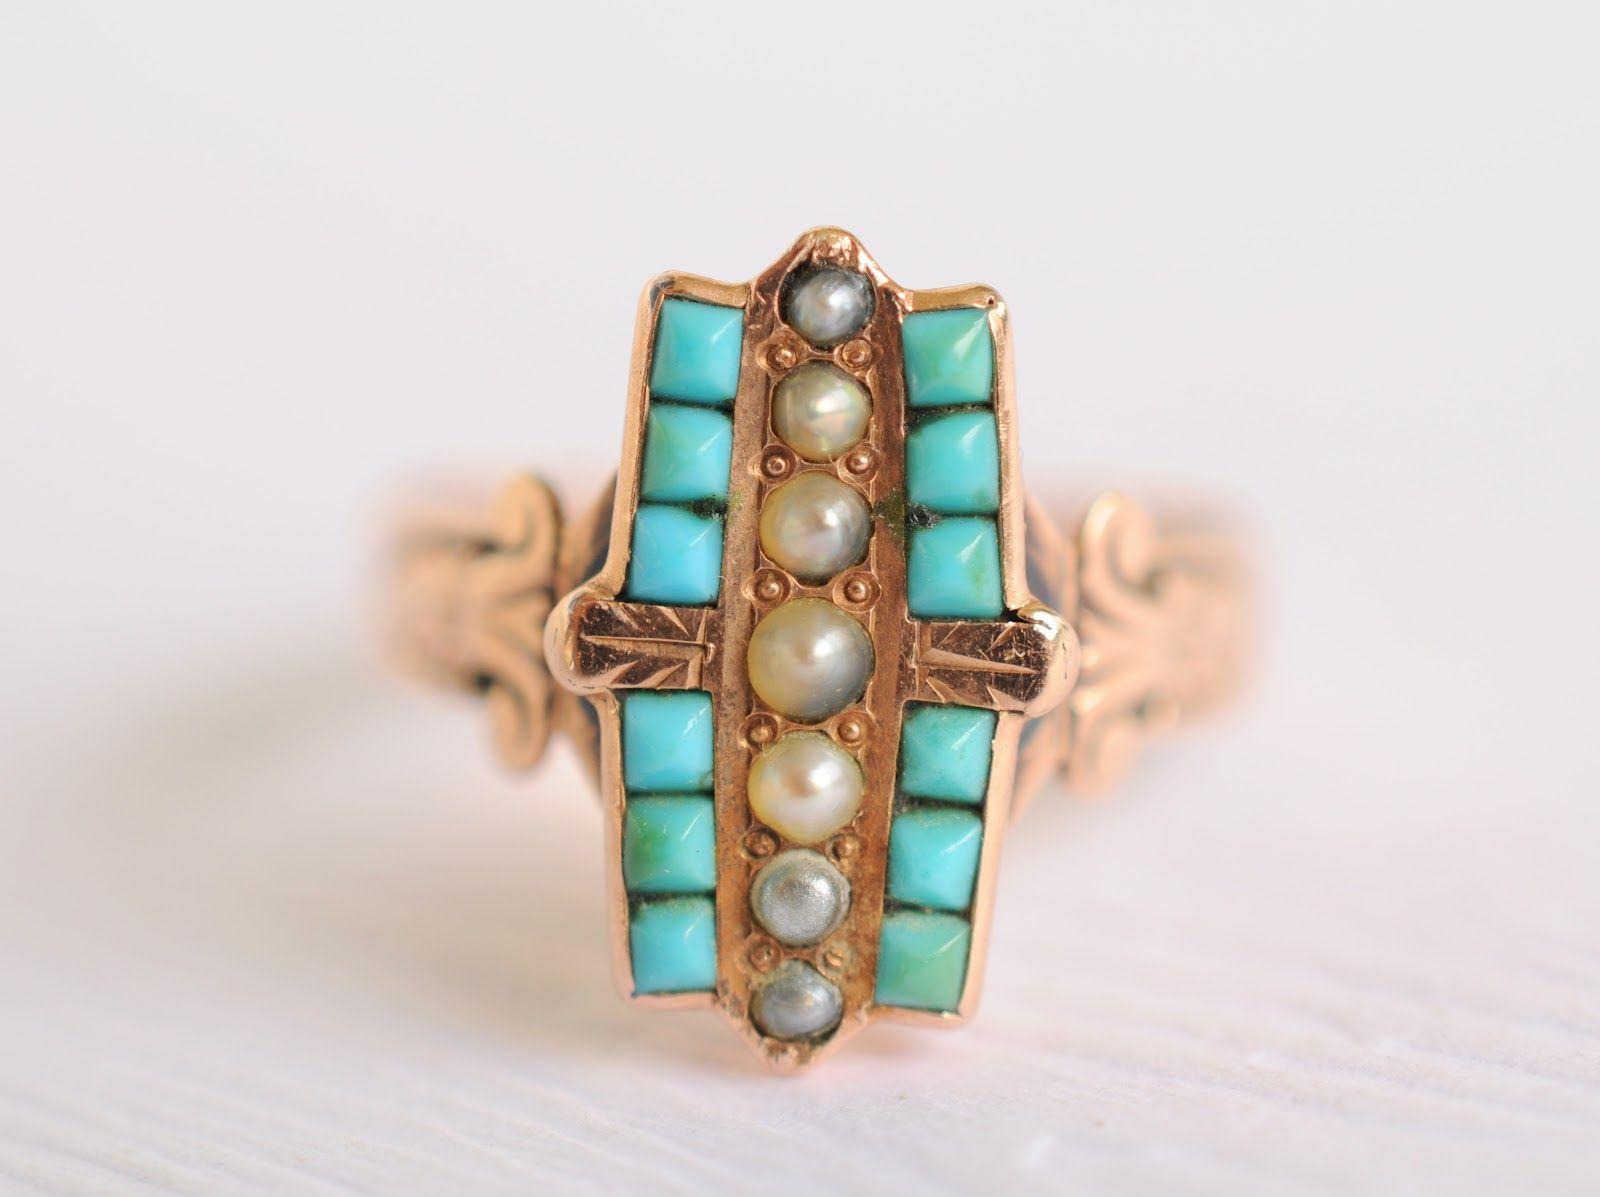 e r i n - a n t i q u e s: 1800s Victorian Turquoise & seed pearls ...